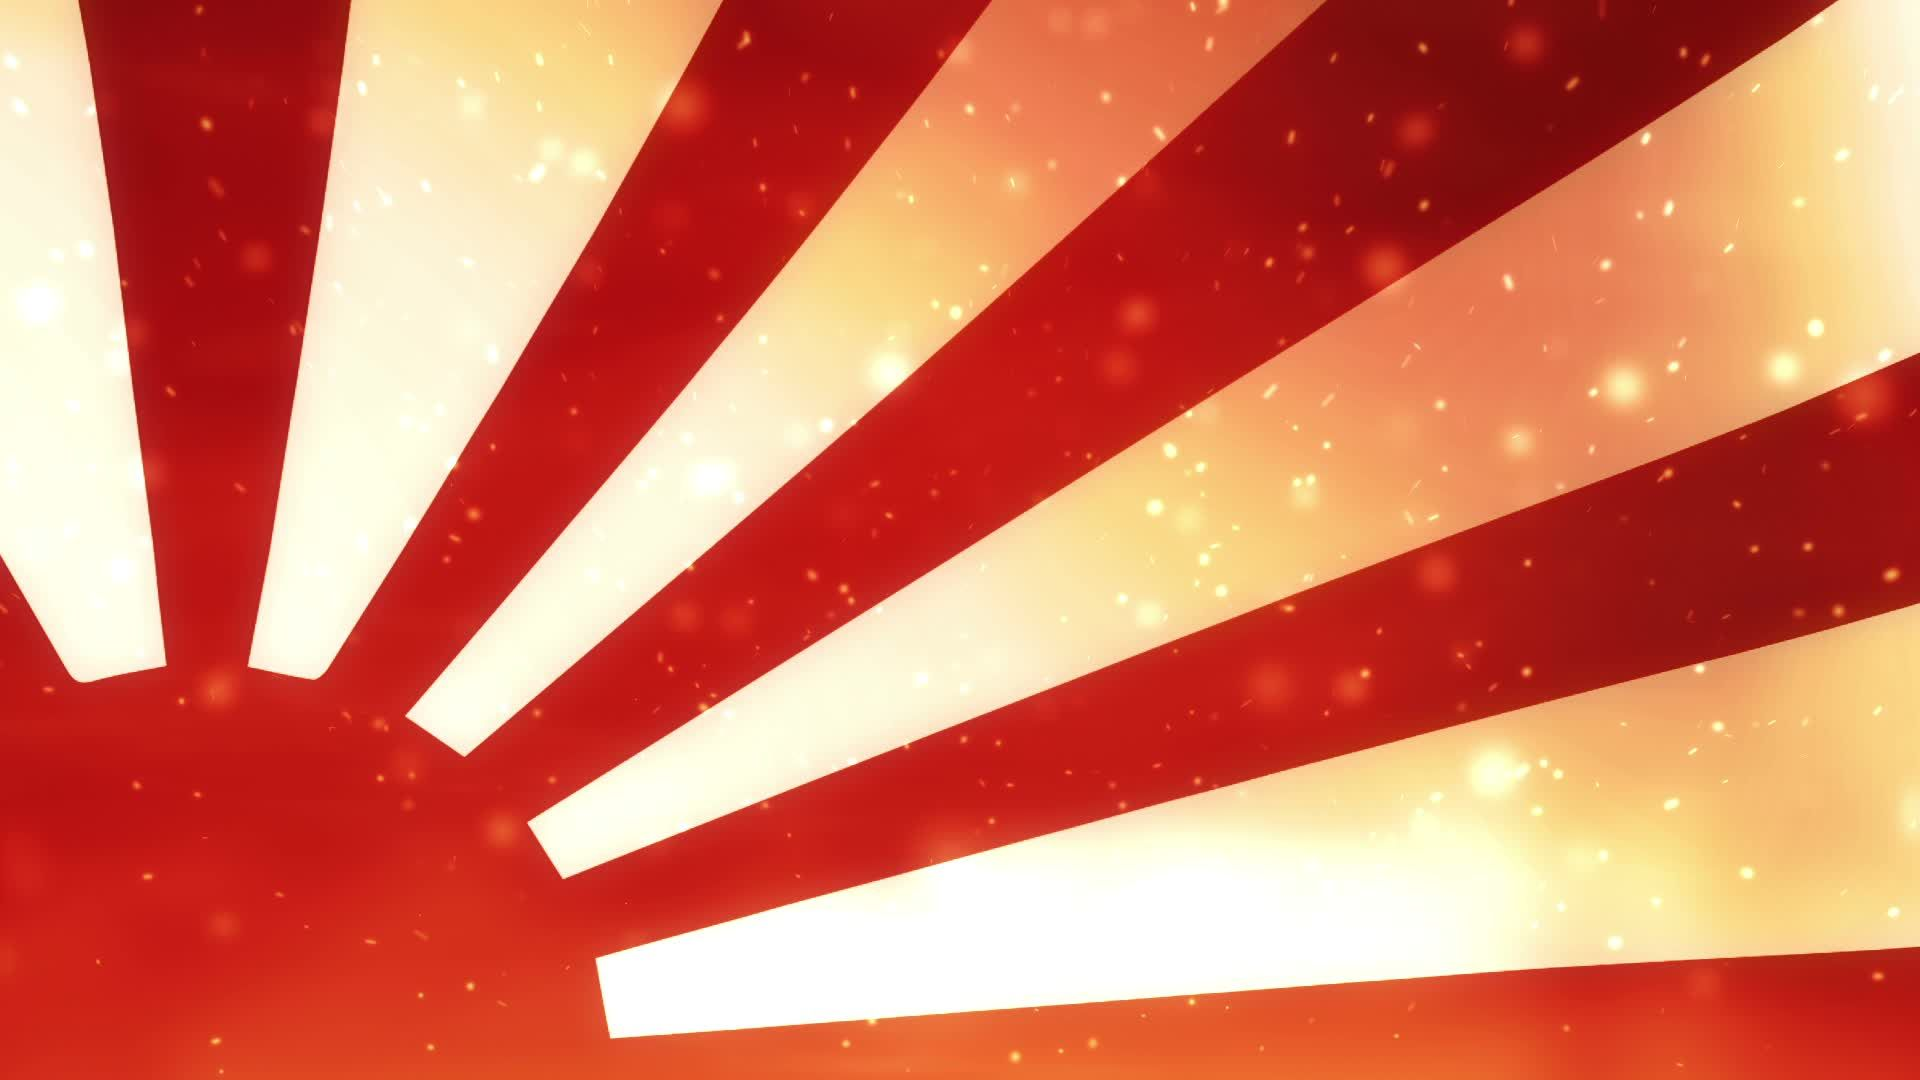 Japanese Rising Sun Flag On Fire Stock Footage Sun Rising Japanese Flag Rising Sun Flag Fire Stock Sunrise